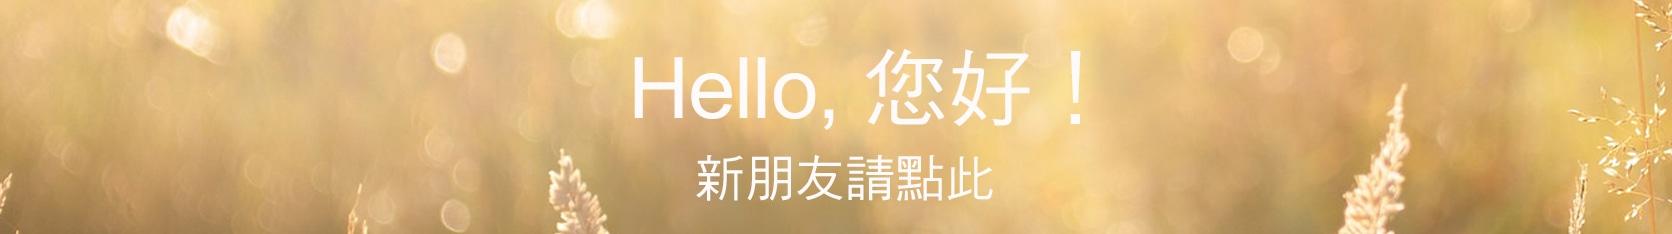 Hello,你好